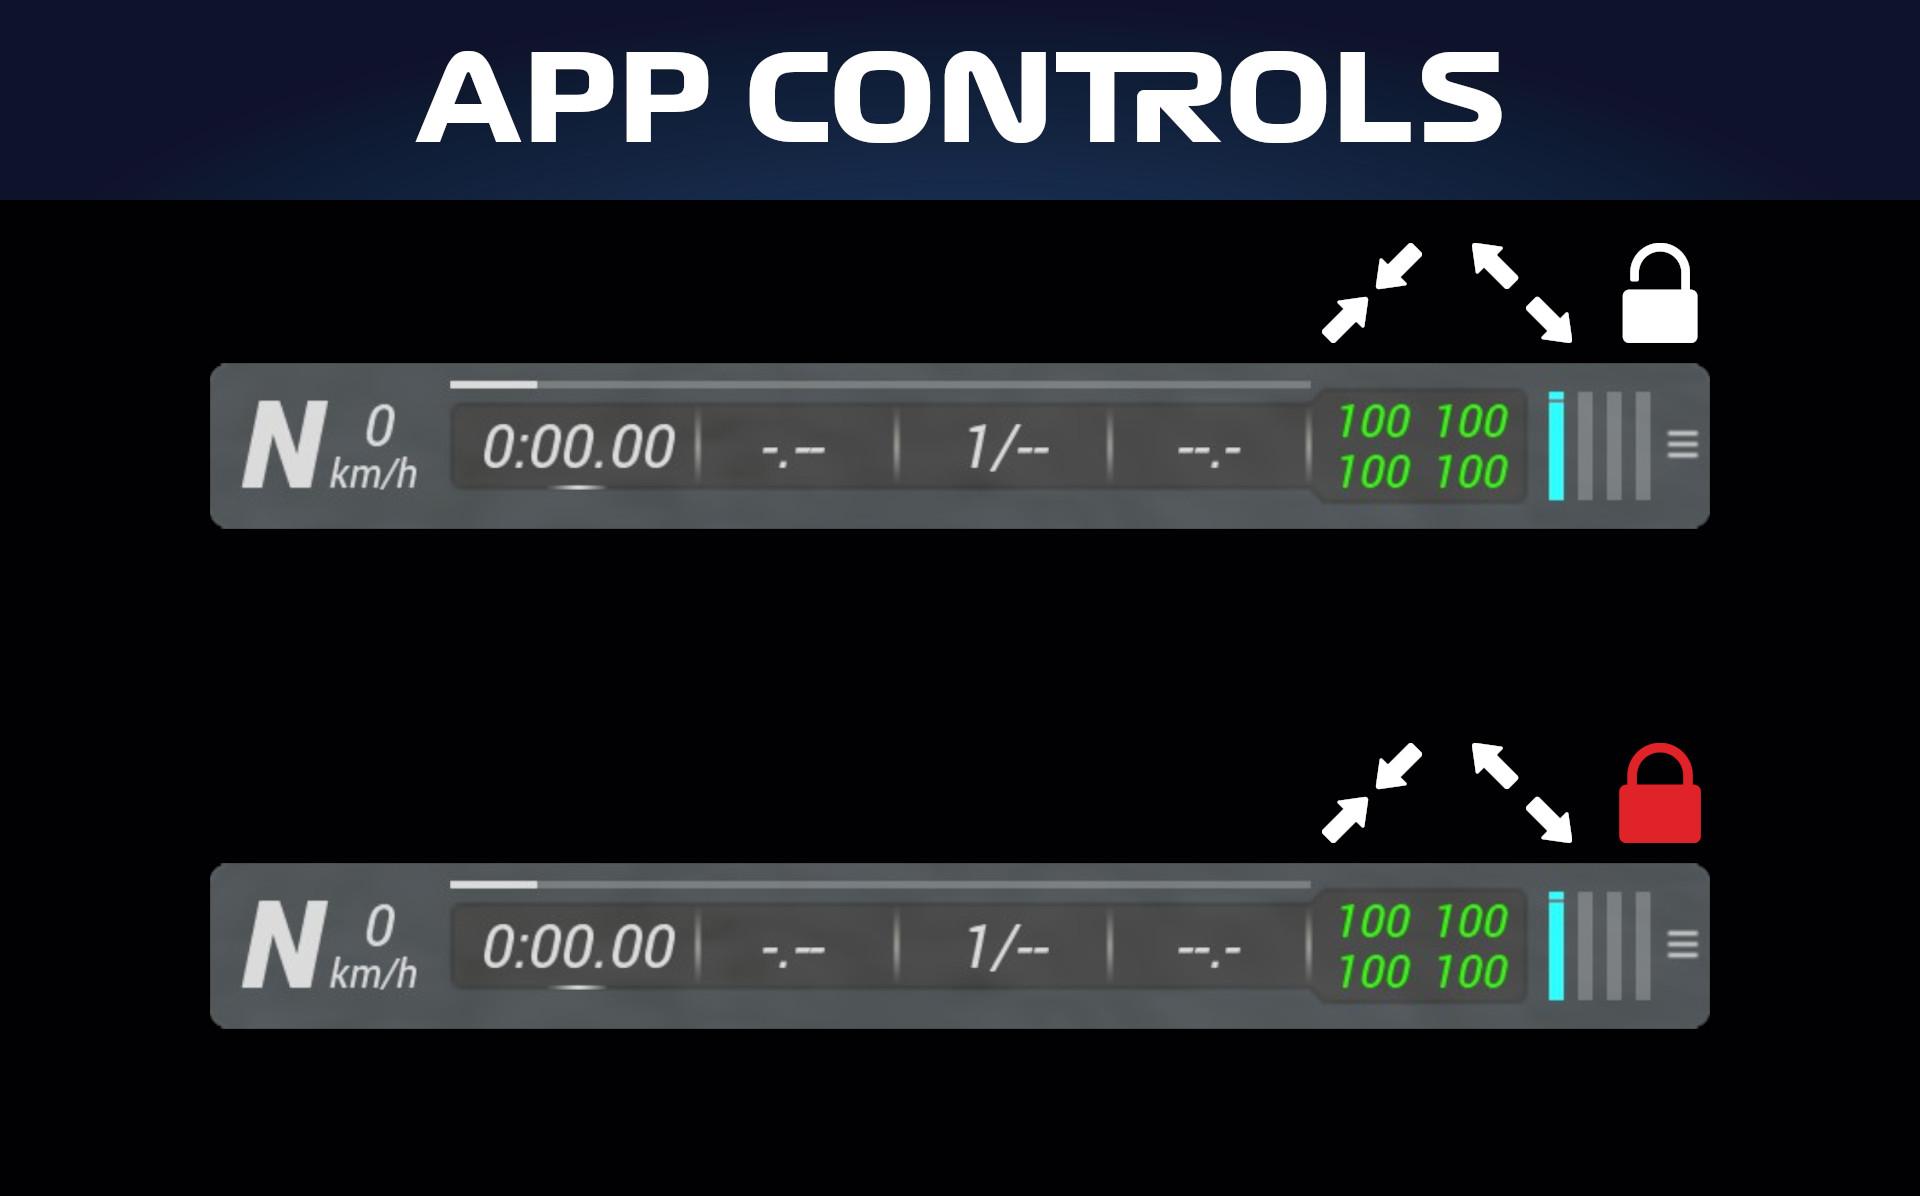 appcontrols.jpg